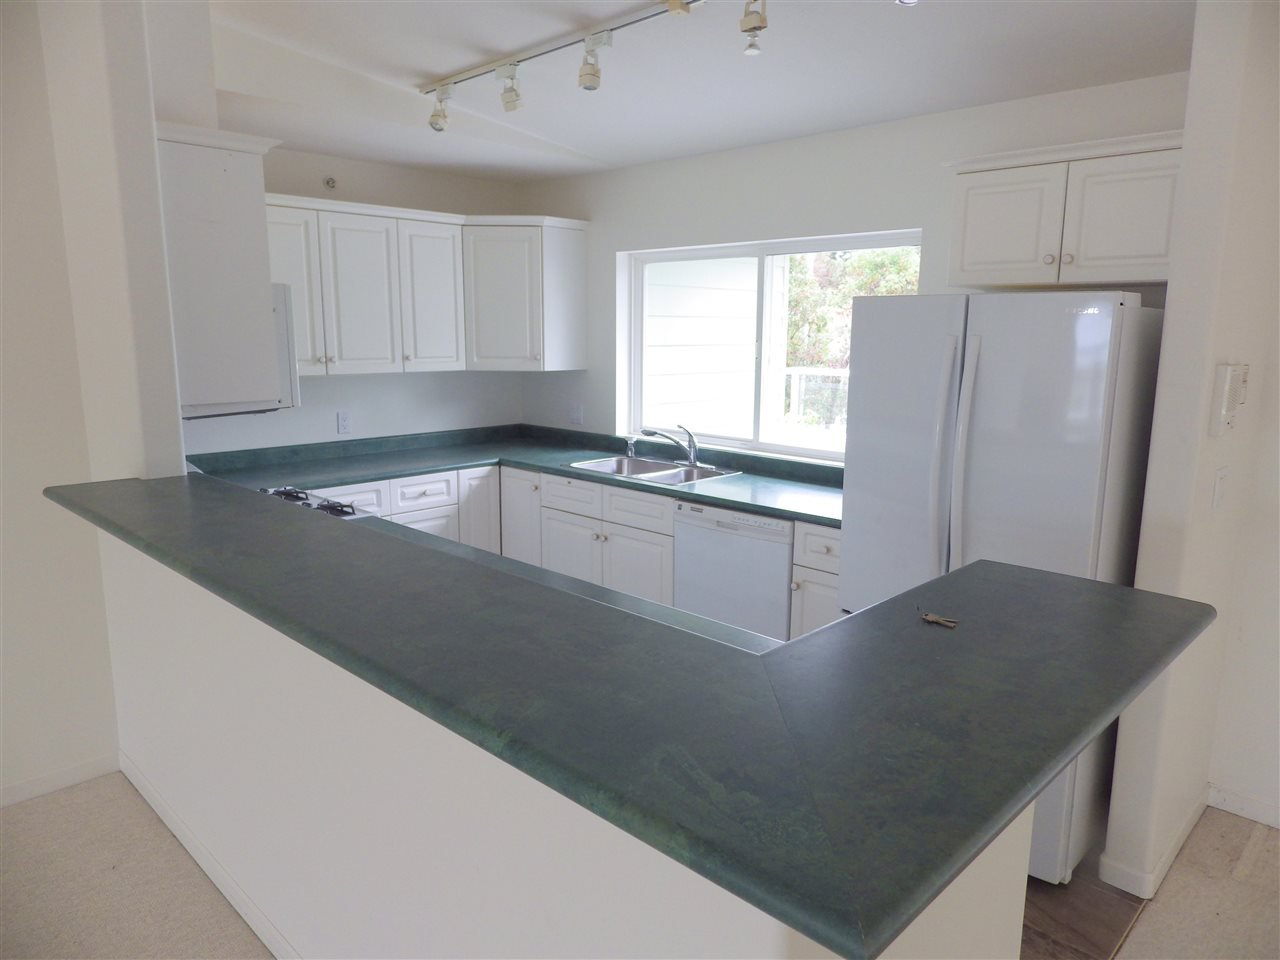 Photo 4: Photos: 207 1585 FIELD Road in Sechelt: Sechelt District Condo for sale (Sunshine Coast)  : MLS®# R2471792